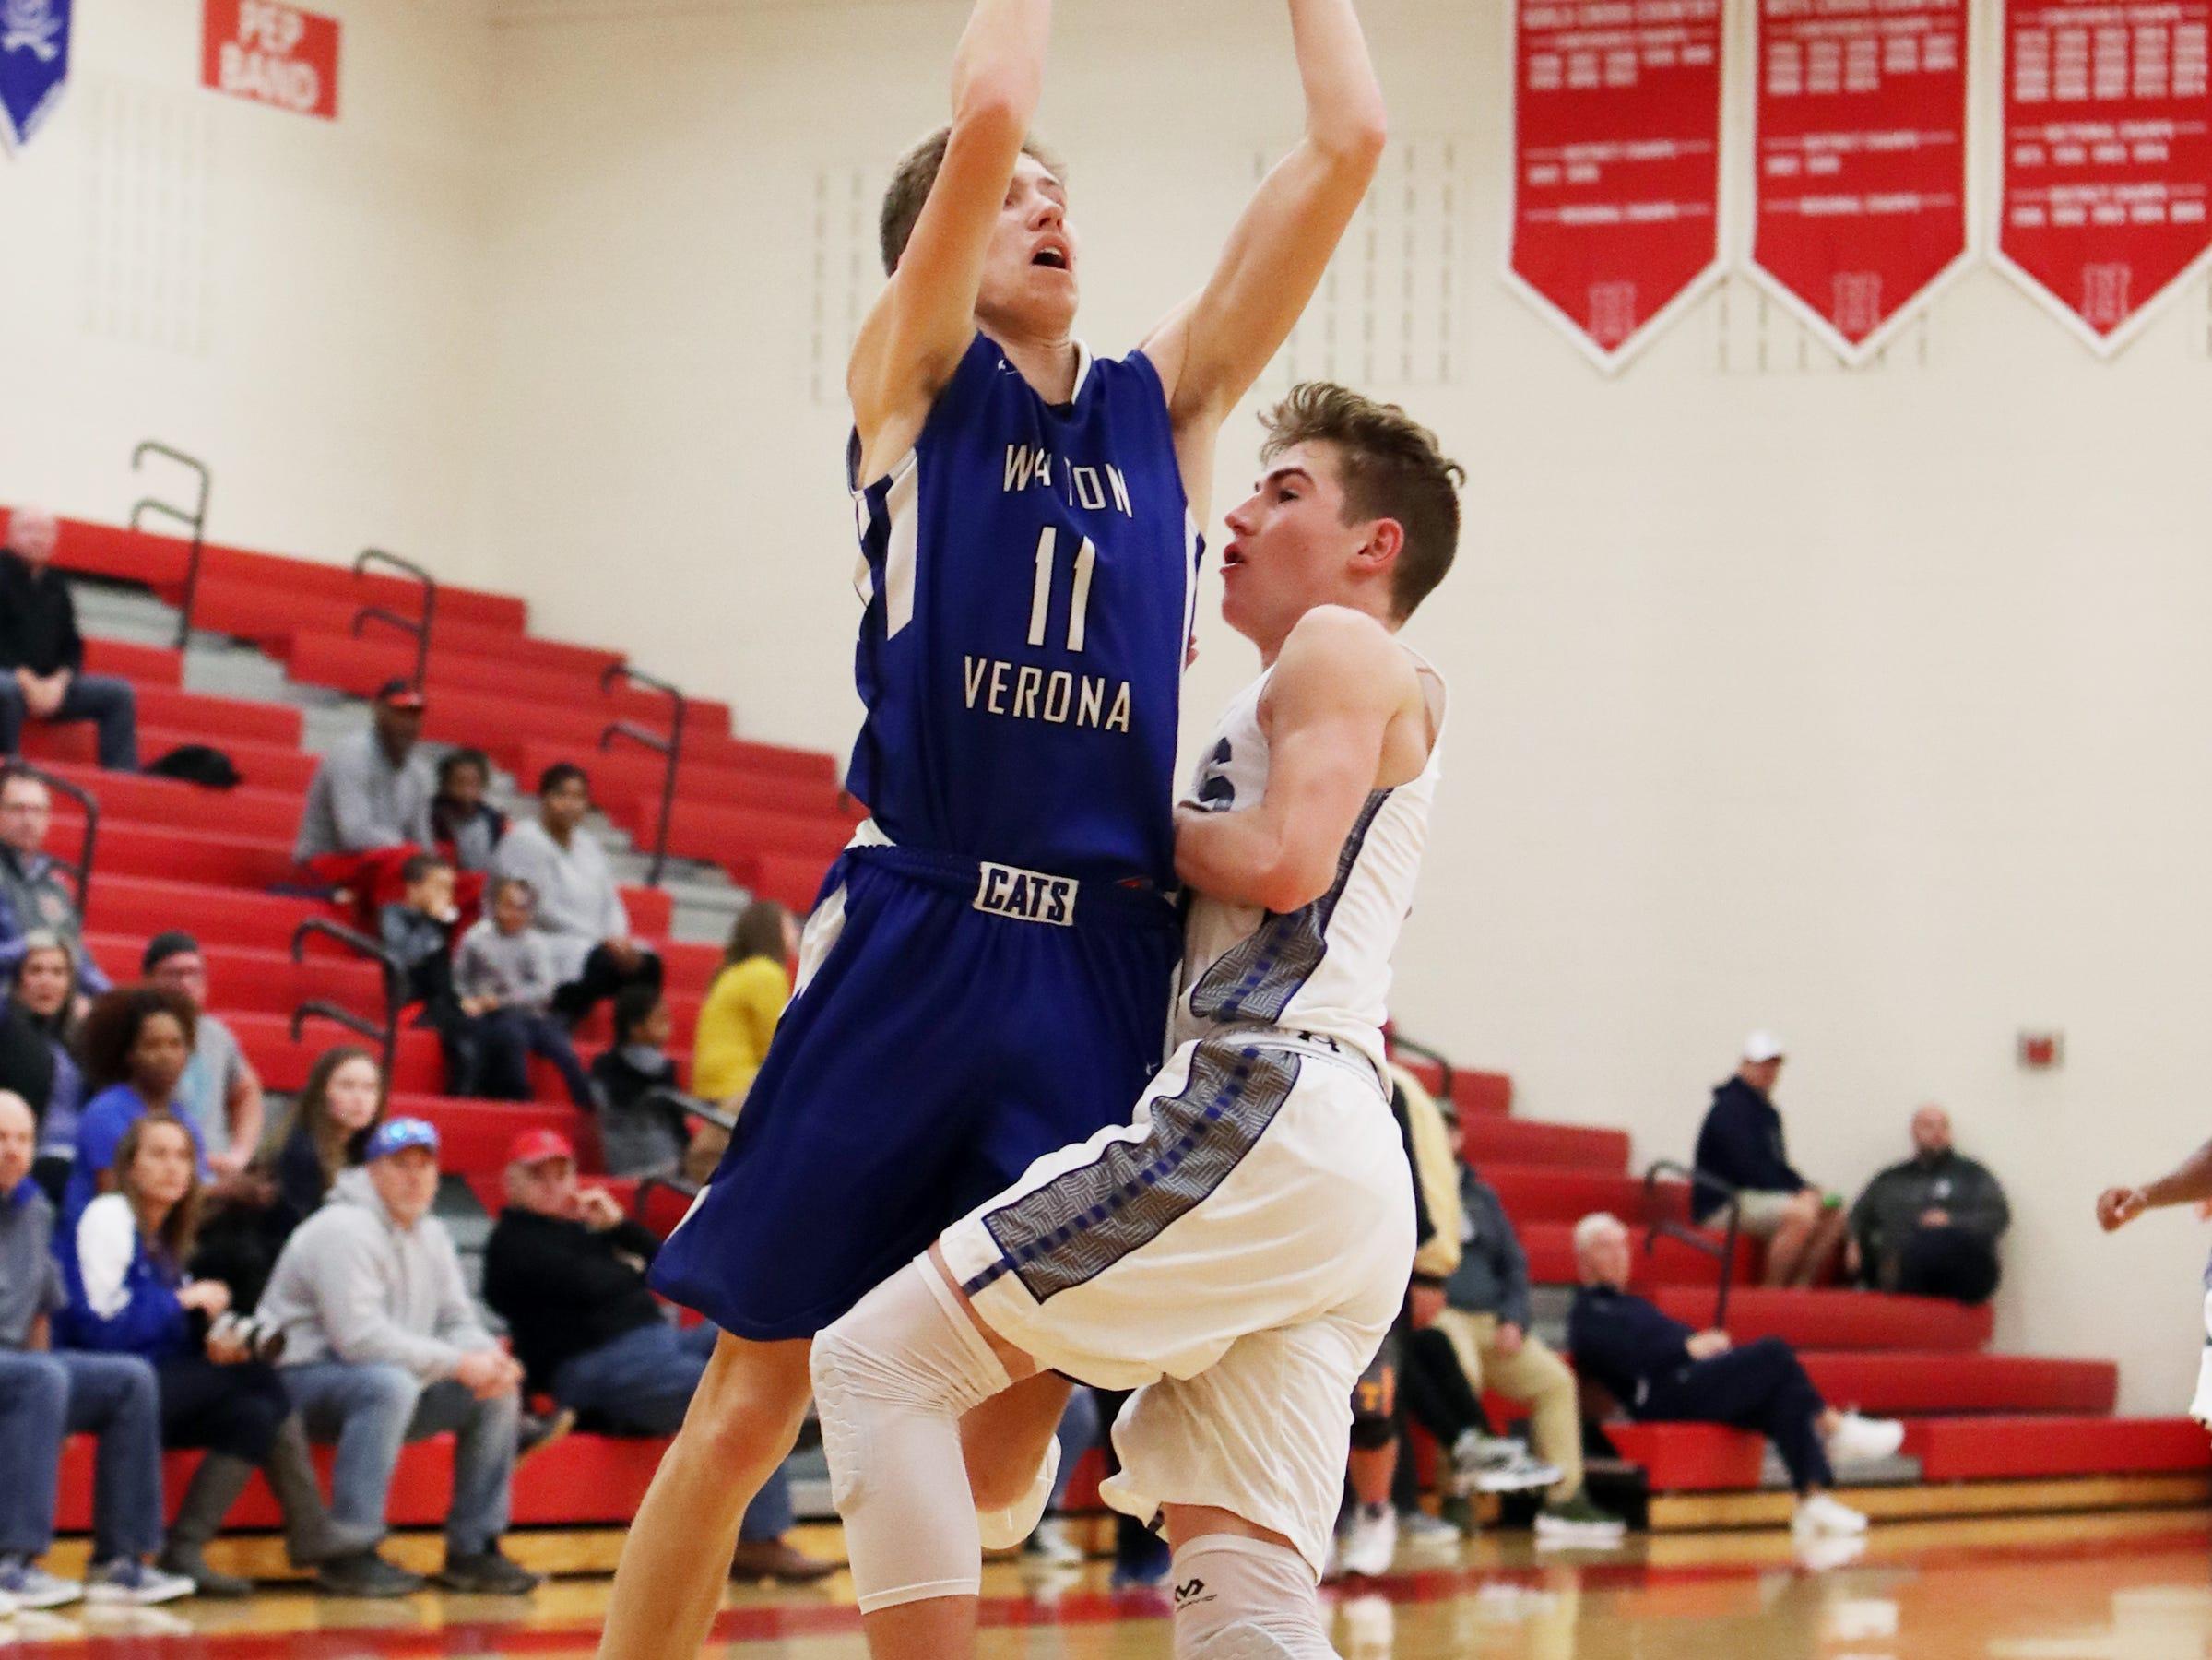 Walton Verona guard Trey Bonne drives and scores at the Ohio Valley Hoops Classic at Hillsboro High School. Walton Verona defeated Xenia 62-54.